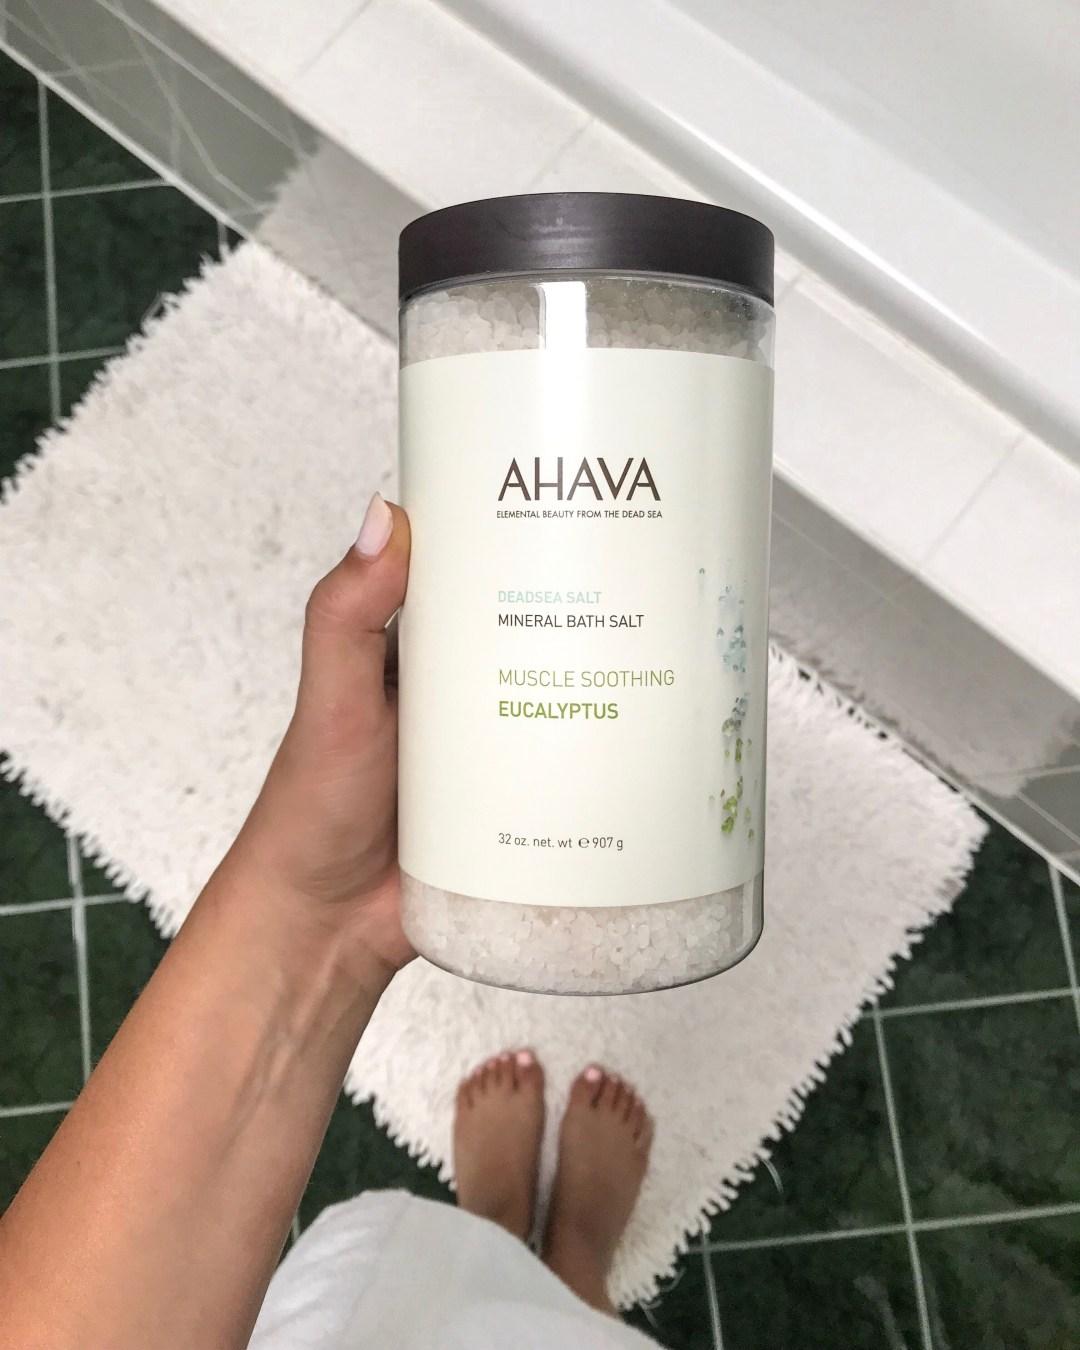 Ahava mineral bath salt review